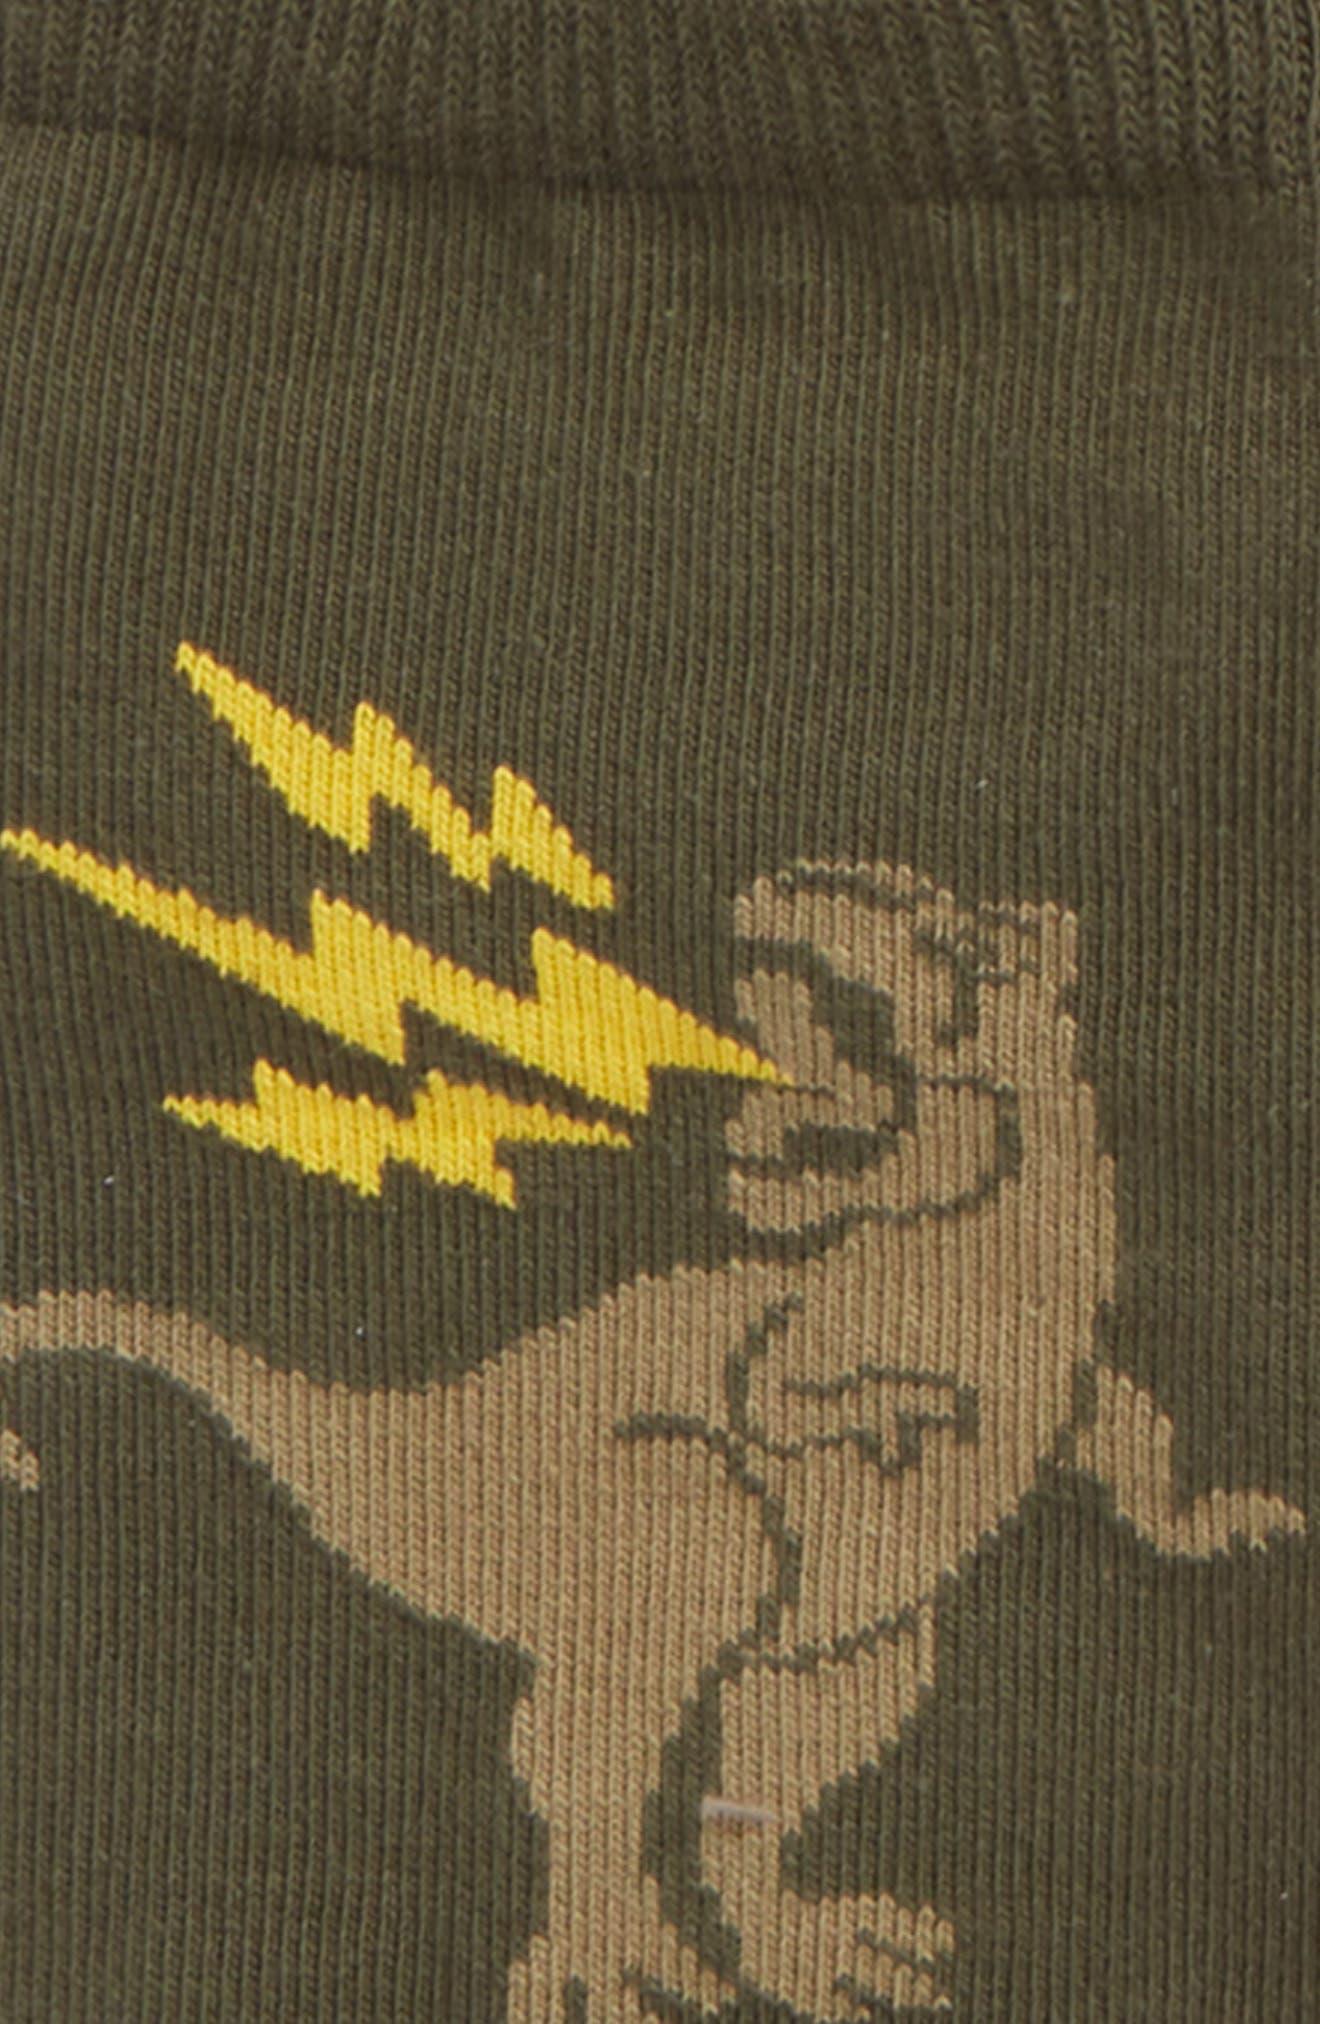 Dino 6-Pack Crew Socks,                             Alternate thumbnail 2, color,                             OLIVE SARMA